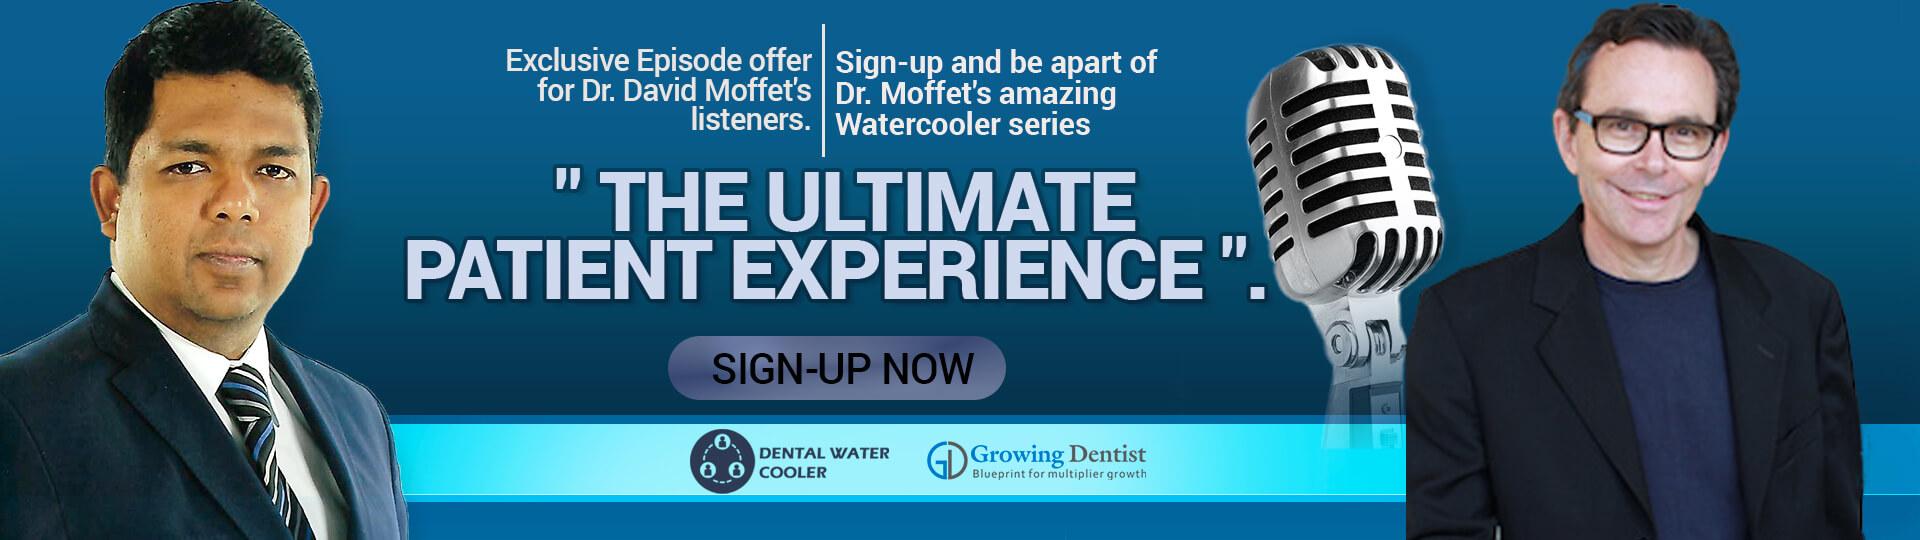 David Moffet Dental Watercooler